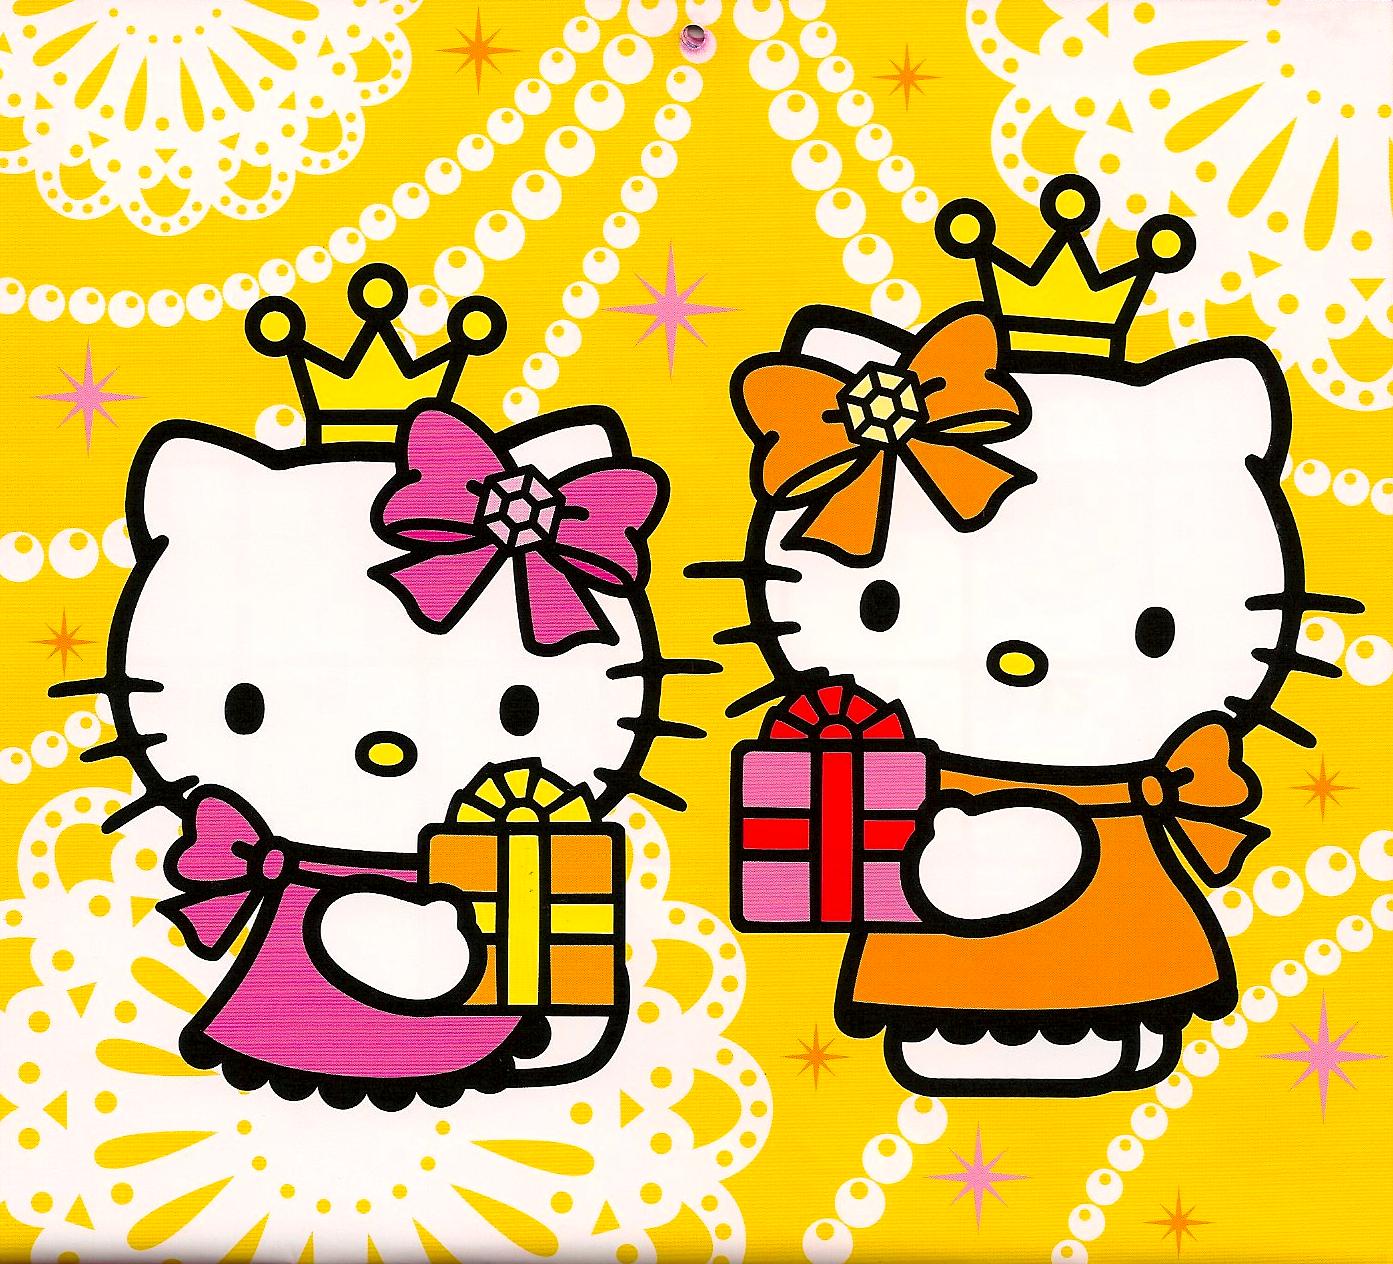 Great Wallpaper Hello Kitty Calendar - hkcalnov  Photograph_633391.png